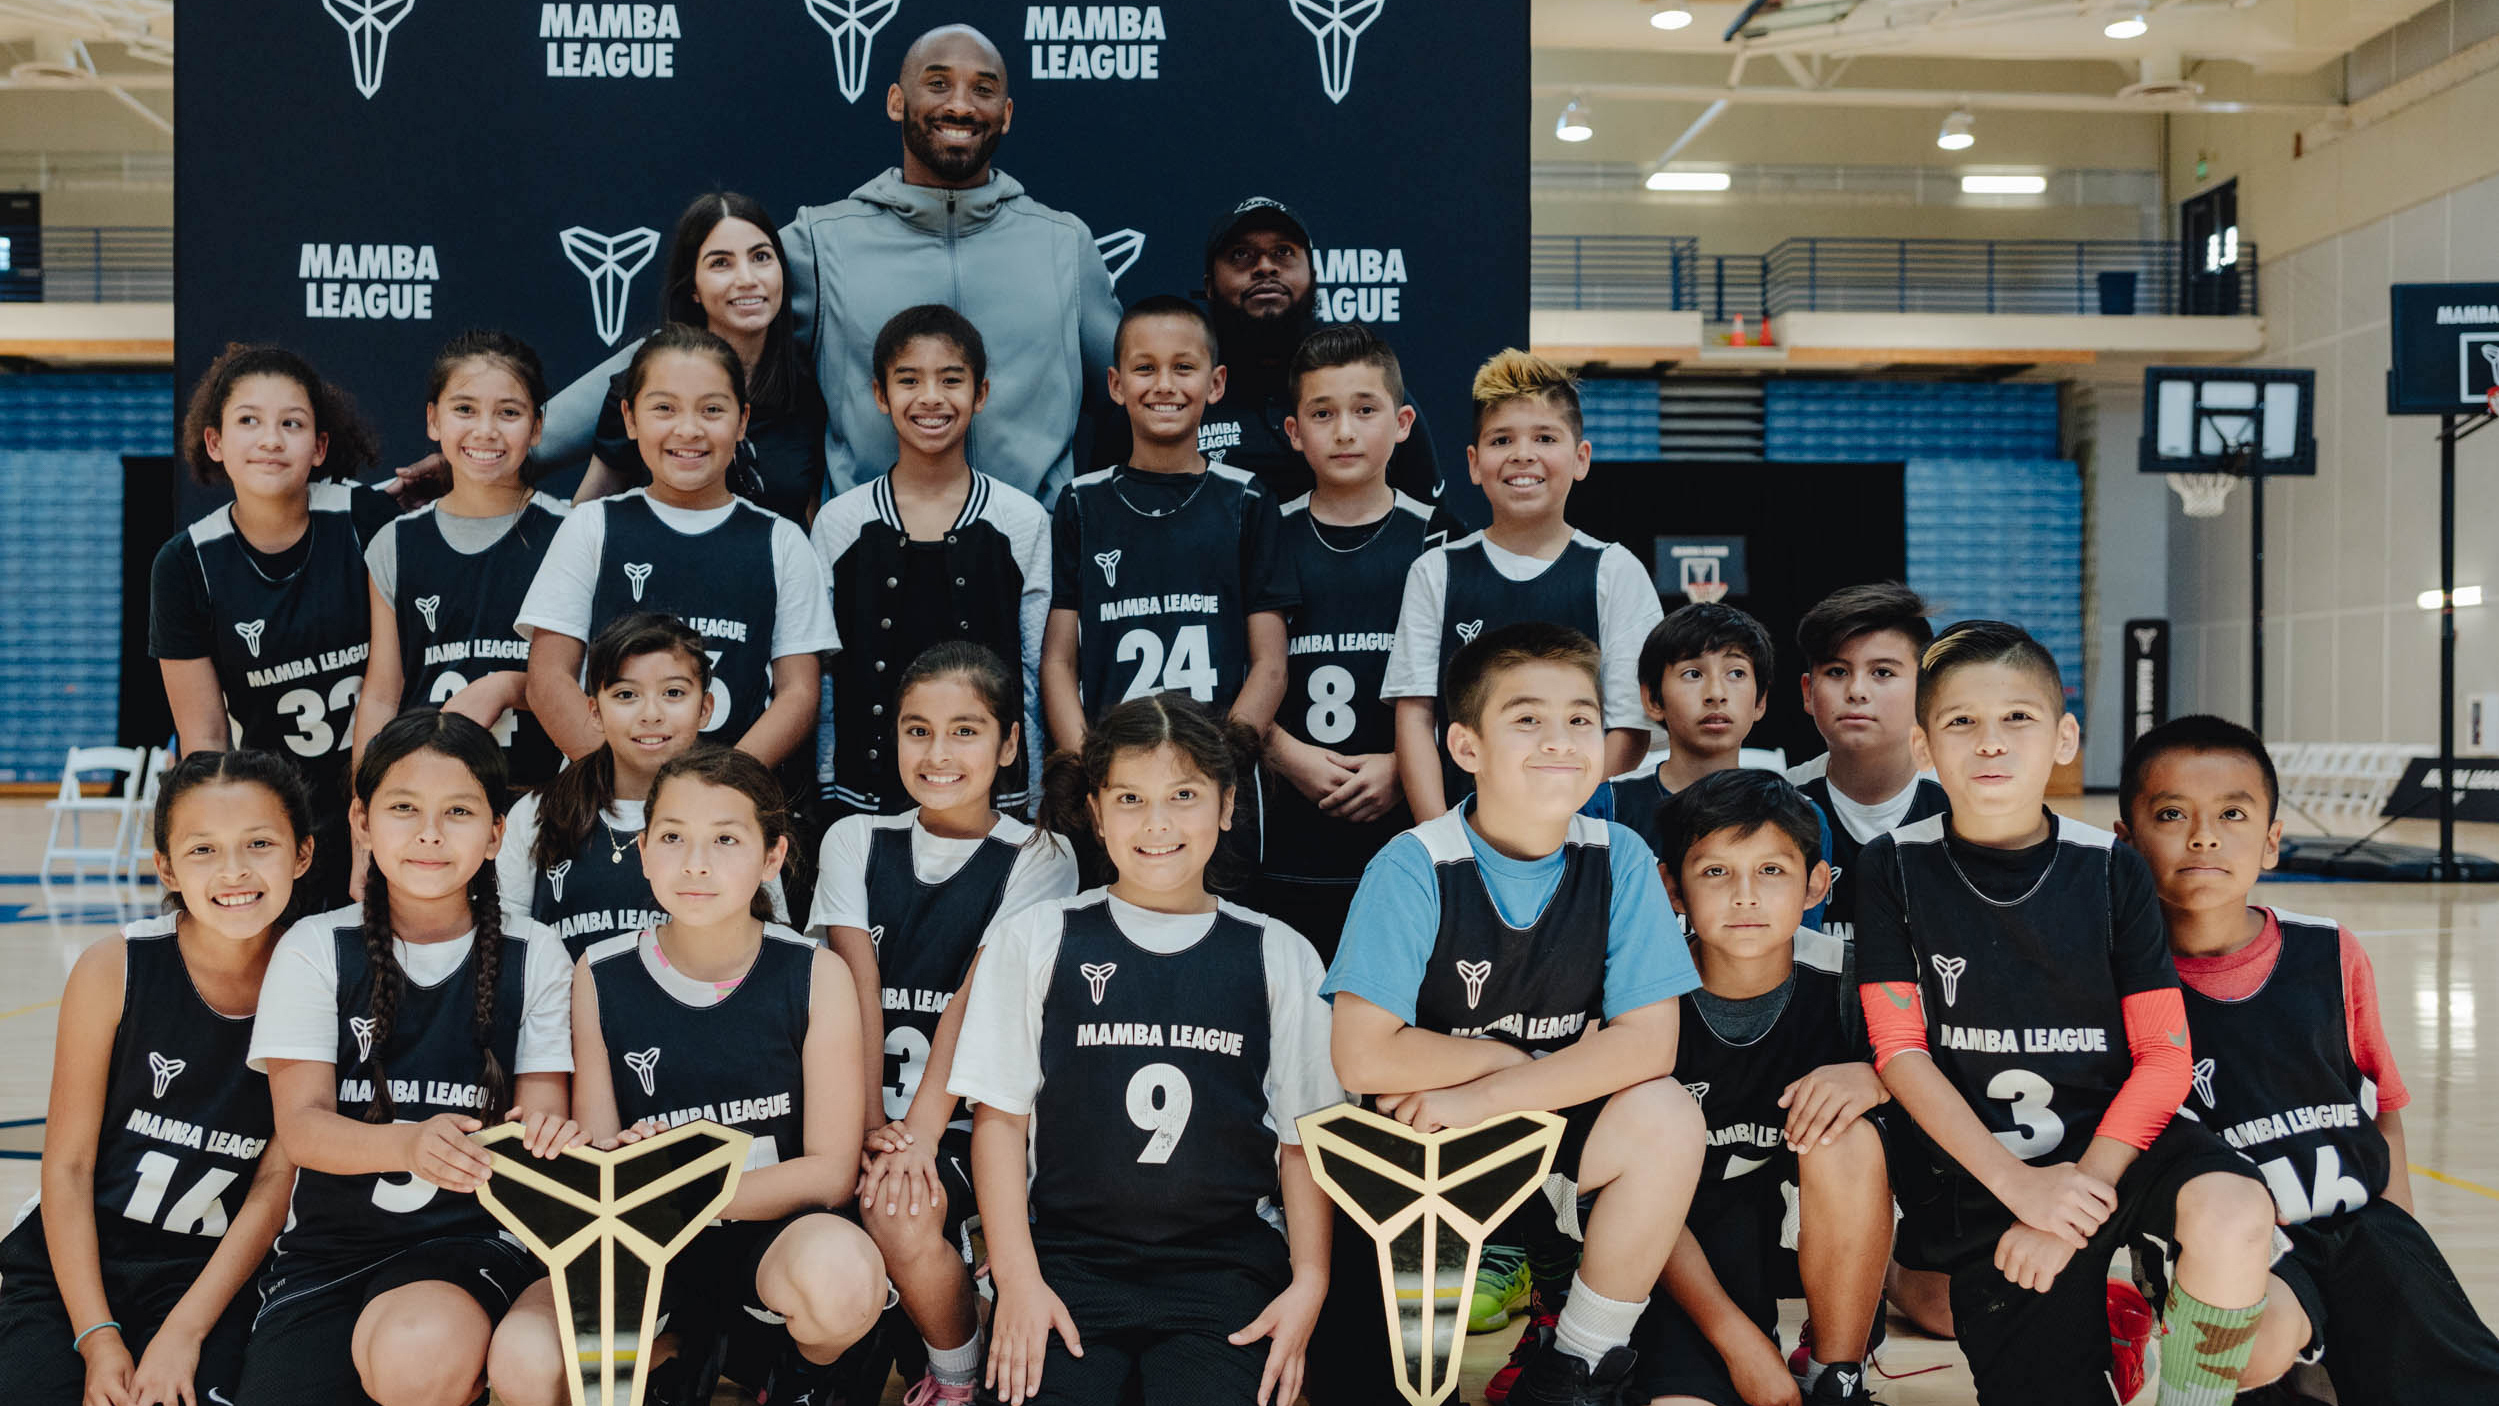 Kobe-Bryant-Mamba-League_original